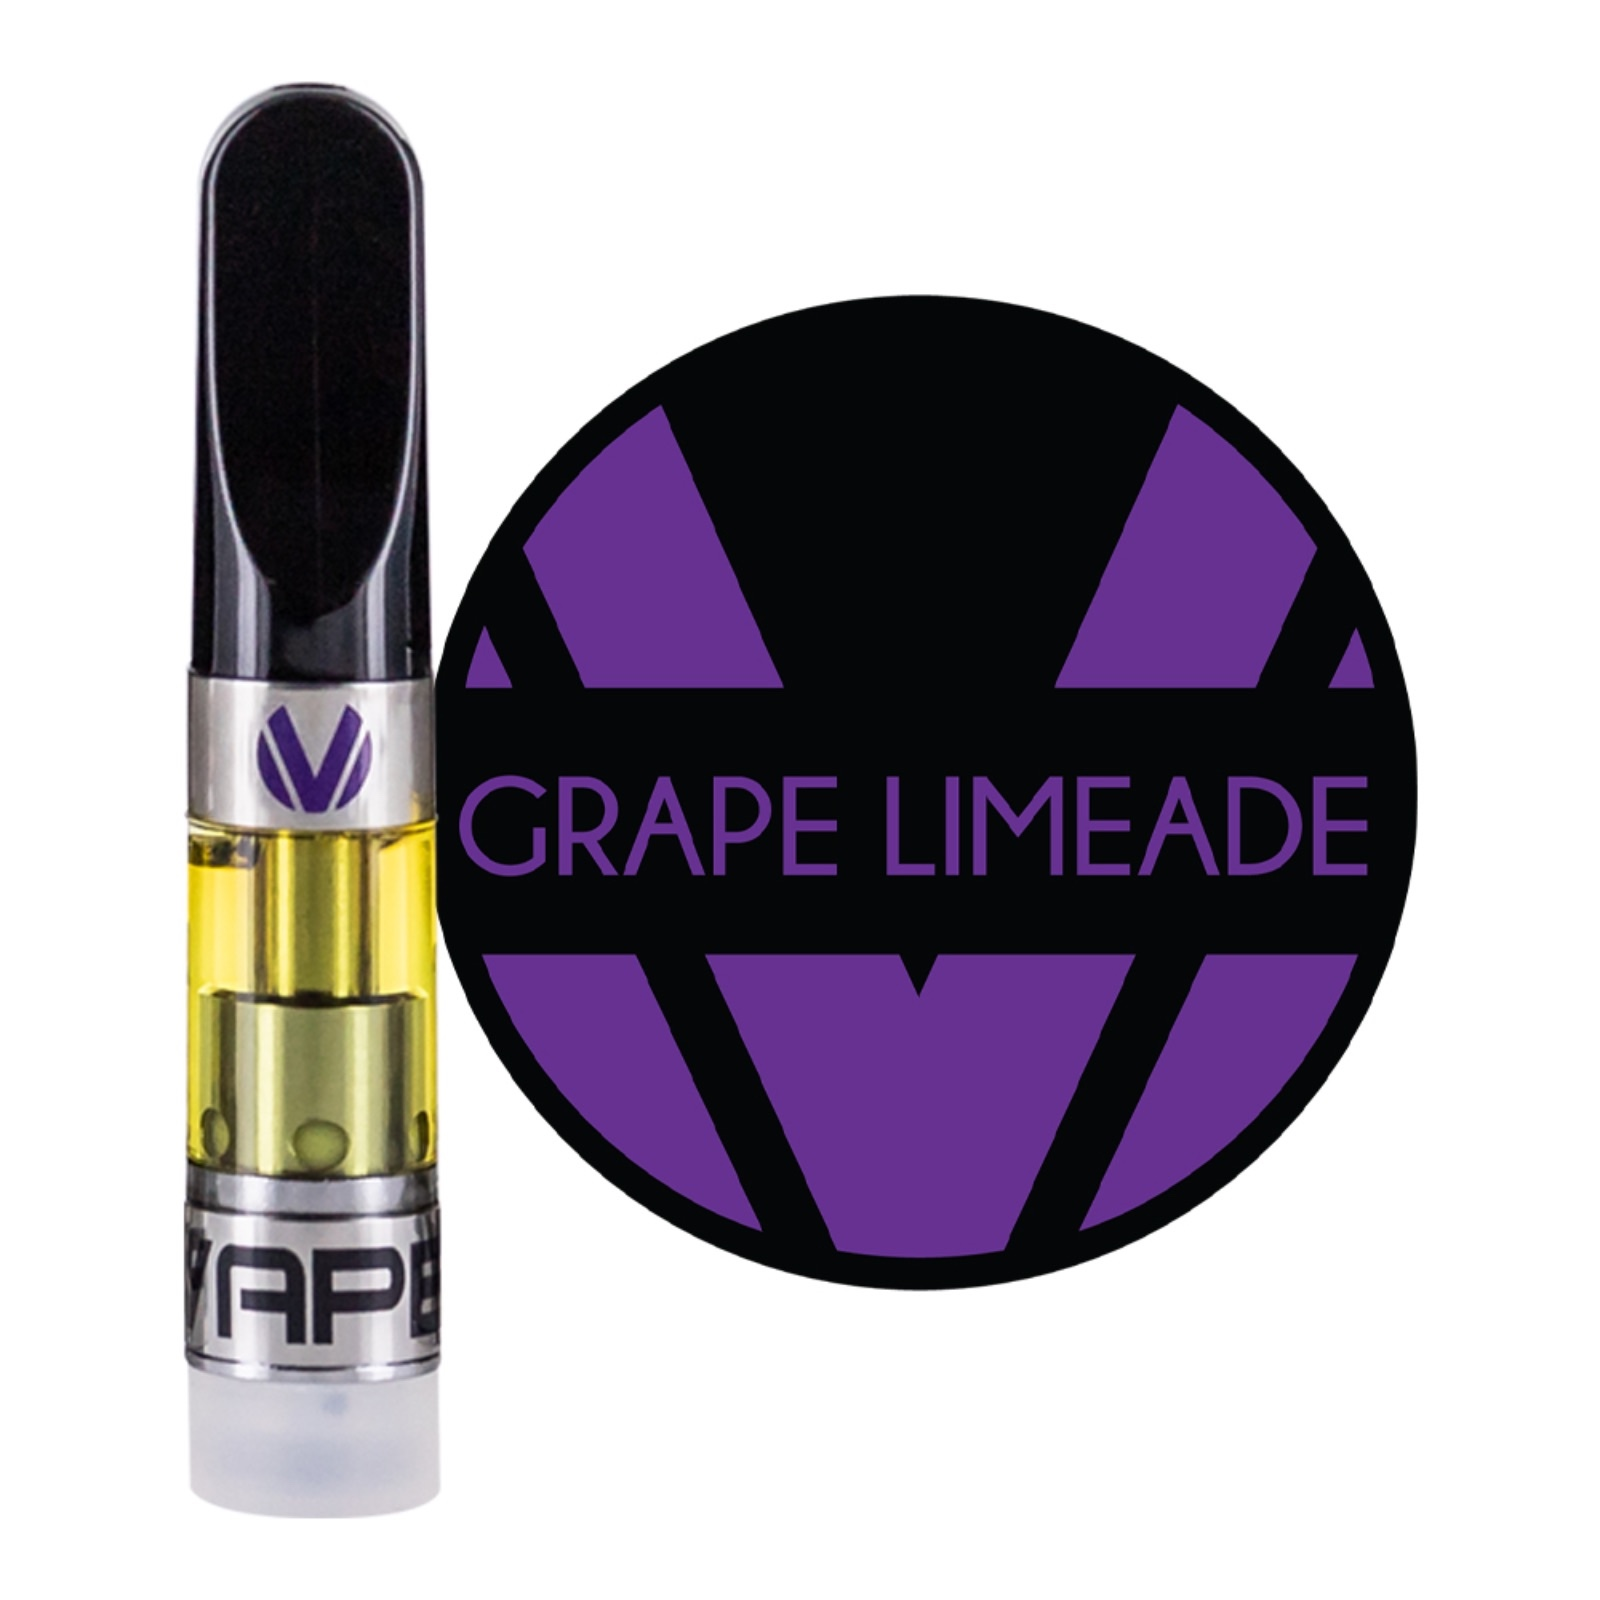 Grape Limeade